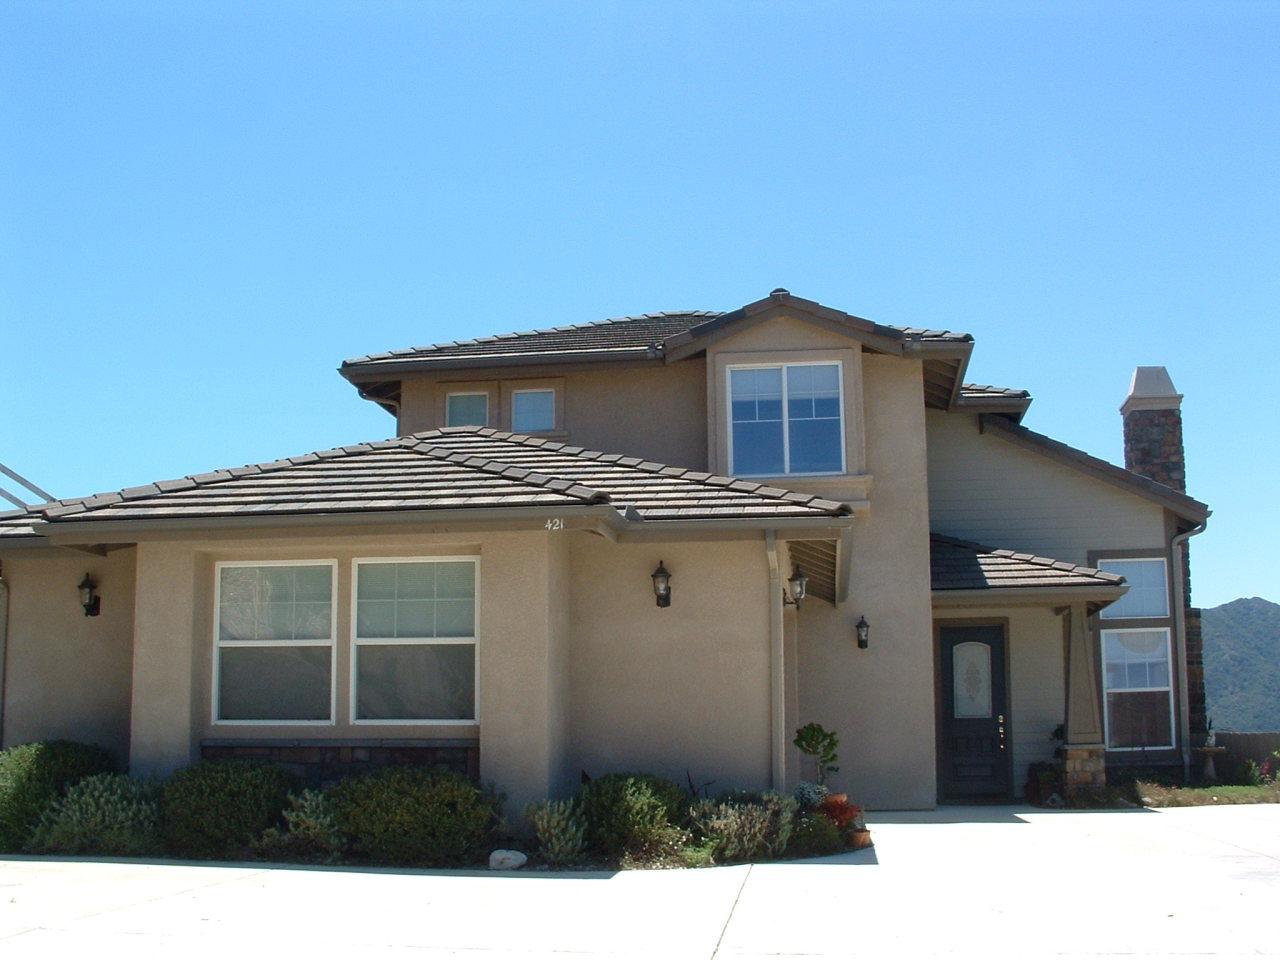 Property photo for 421 Via Corona Buellton, California 93427 - 11-2813